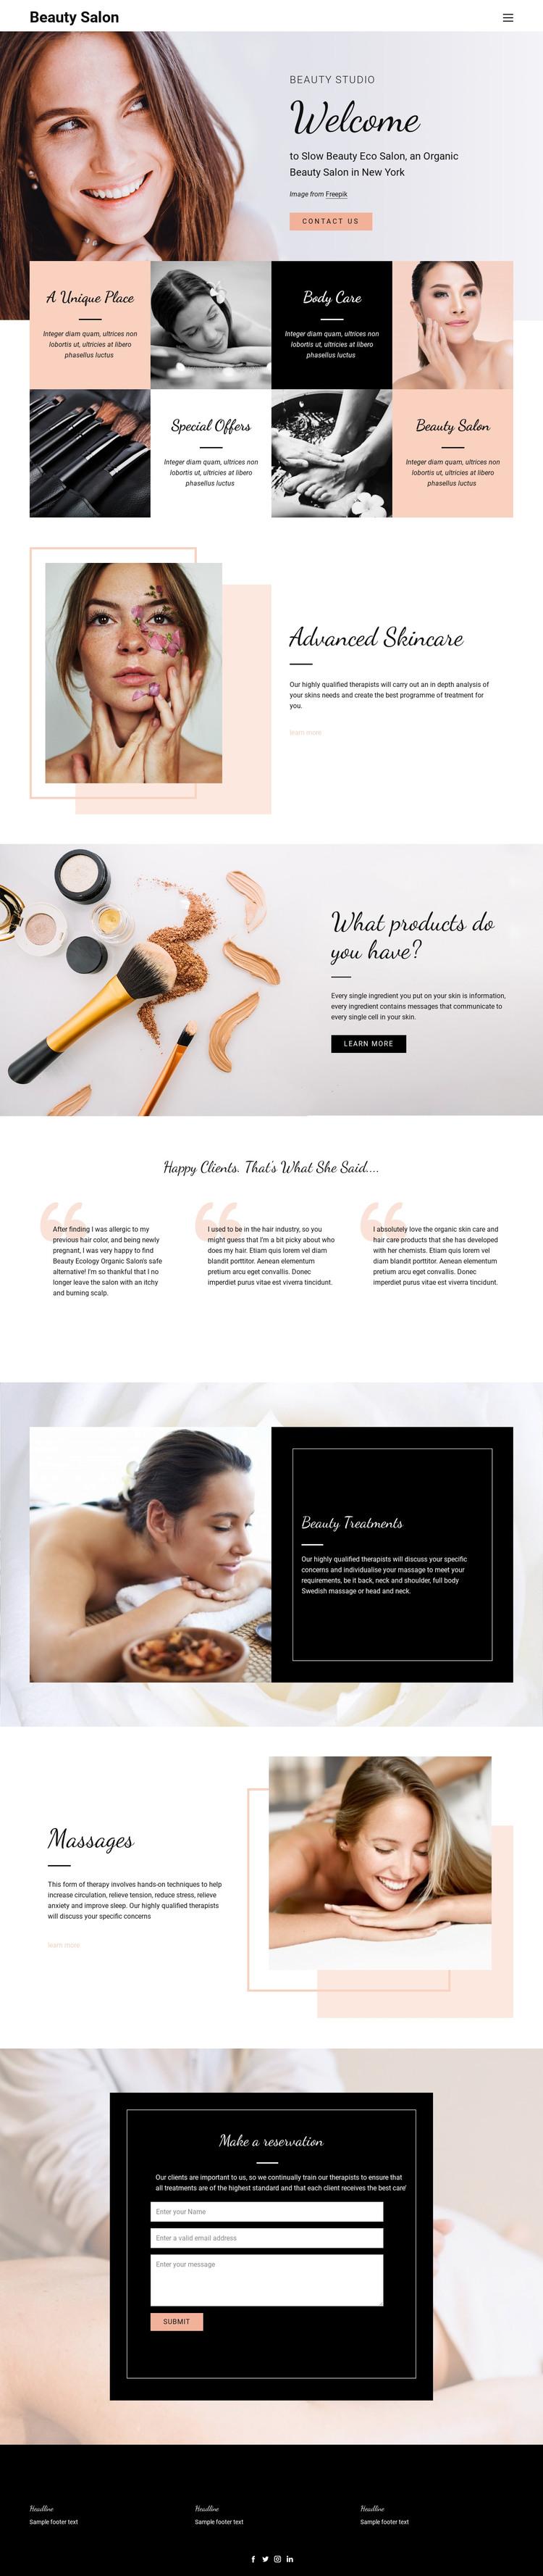 Hair, nail and beauty salon WordPress Theme